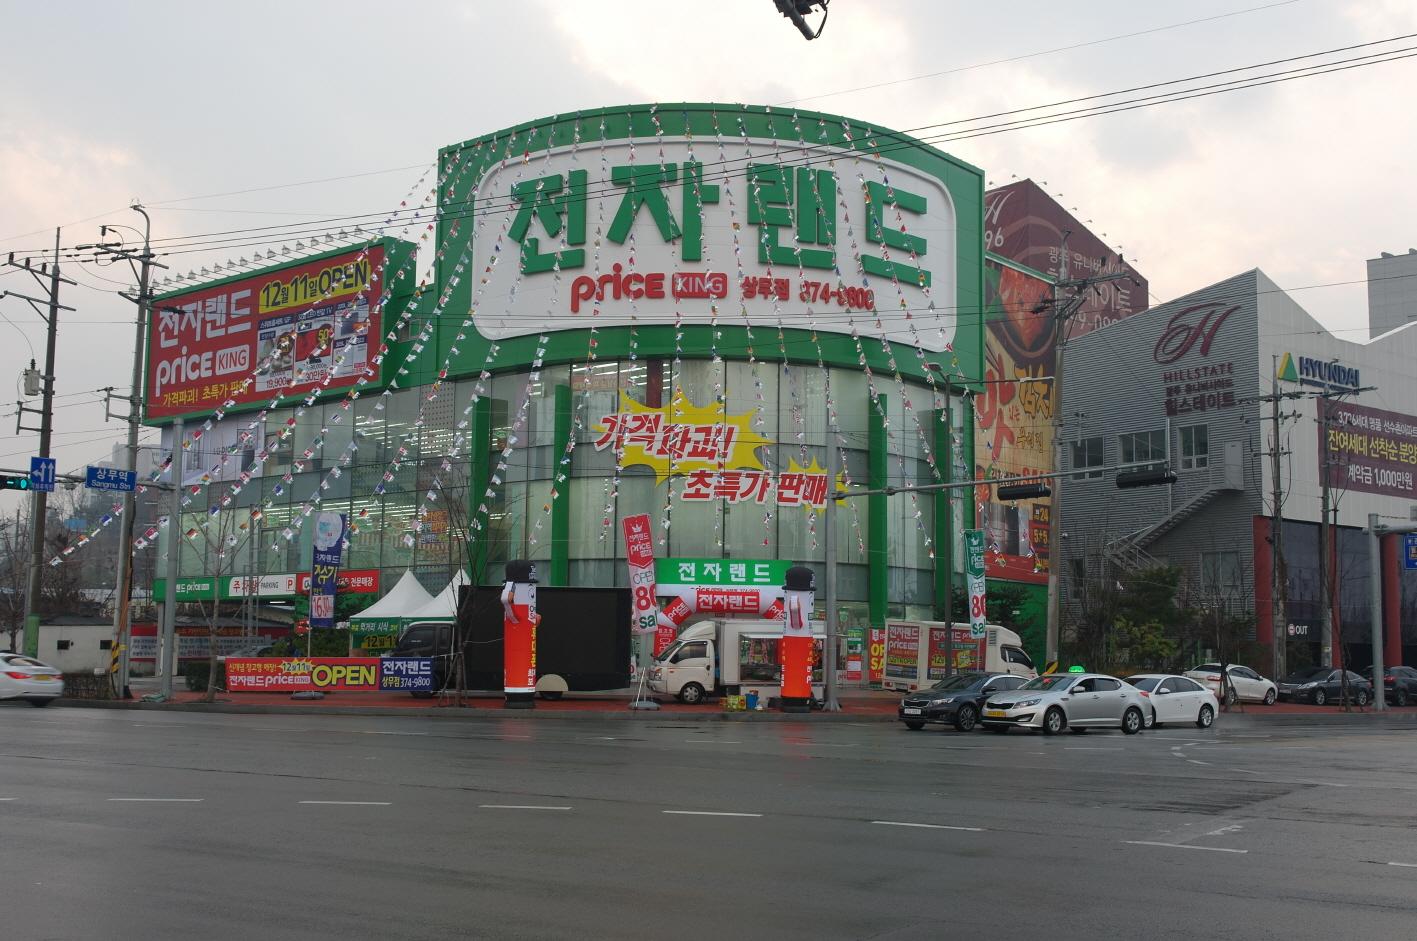 Price King电子商城尚武店 (전자랜드 프라이스킹 상무점)